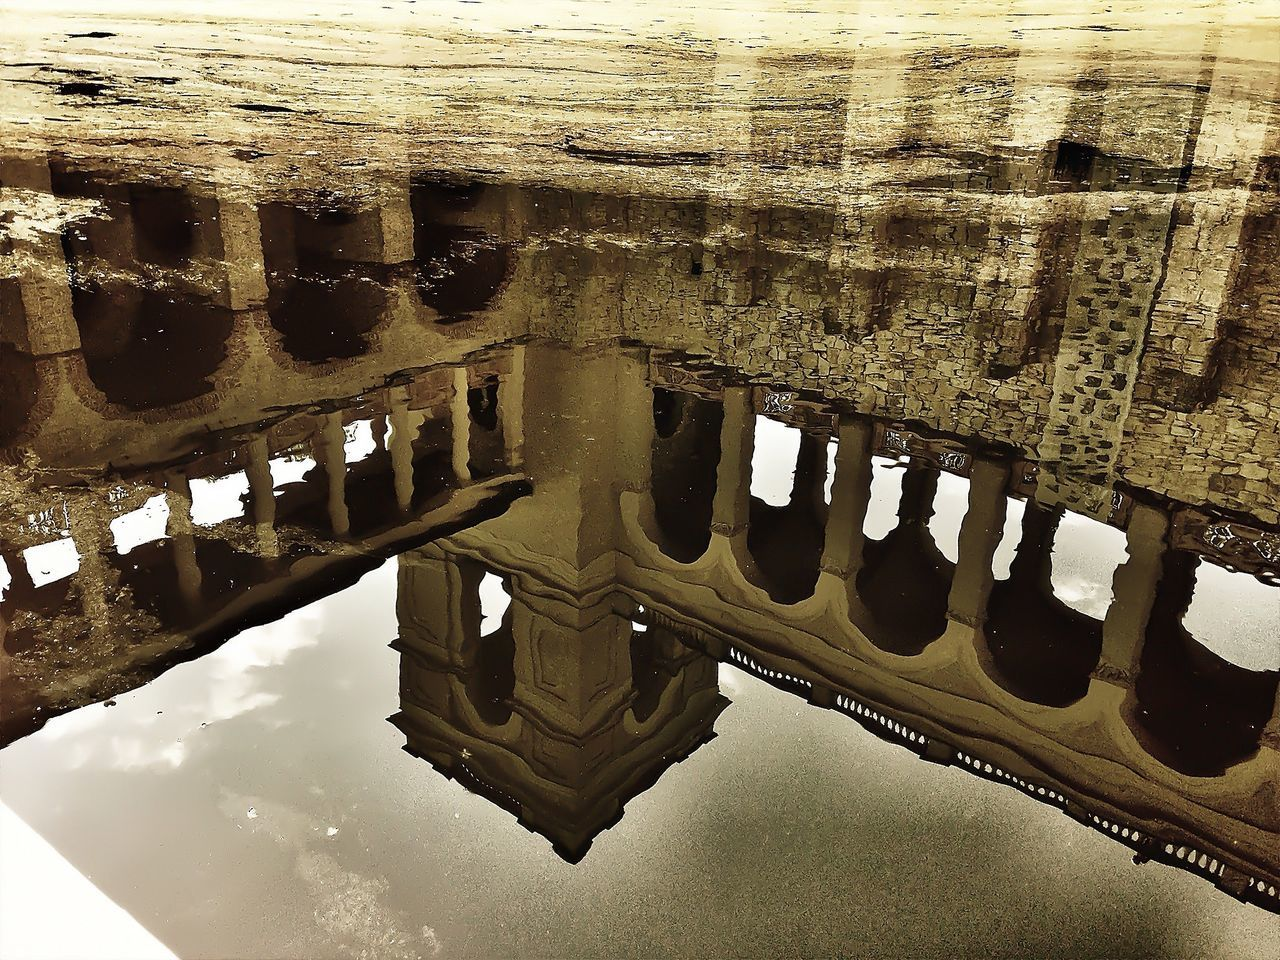 EyeEm Potsdam Meetup Reflection Water Reflections Puddleography